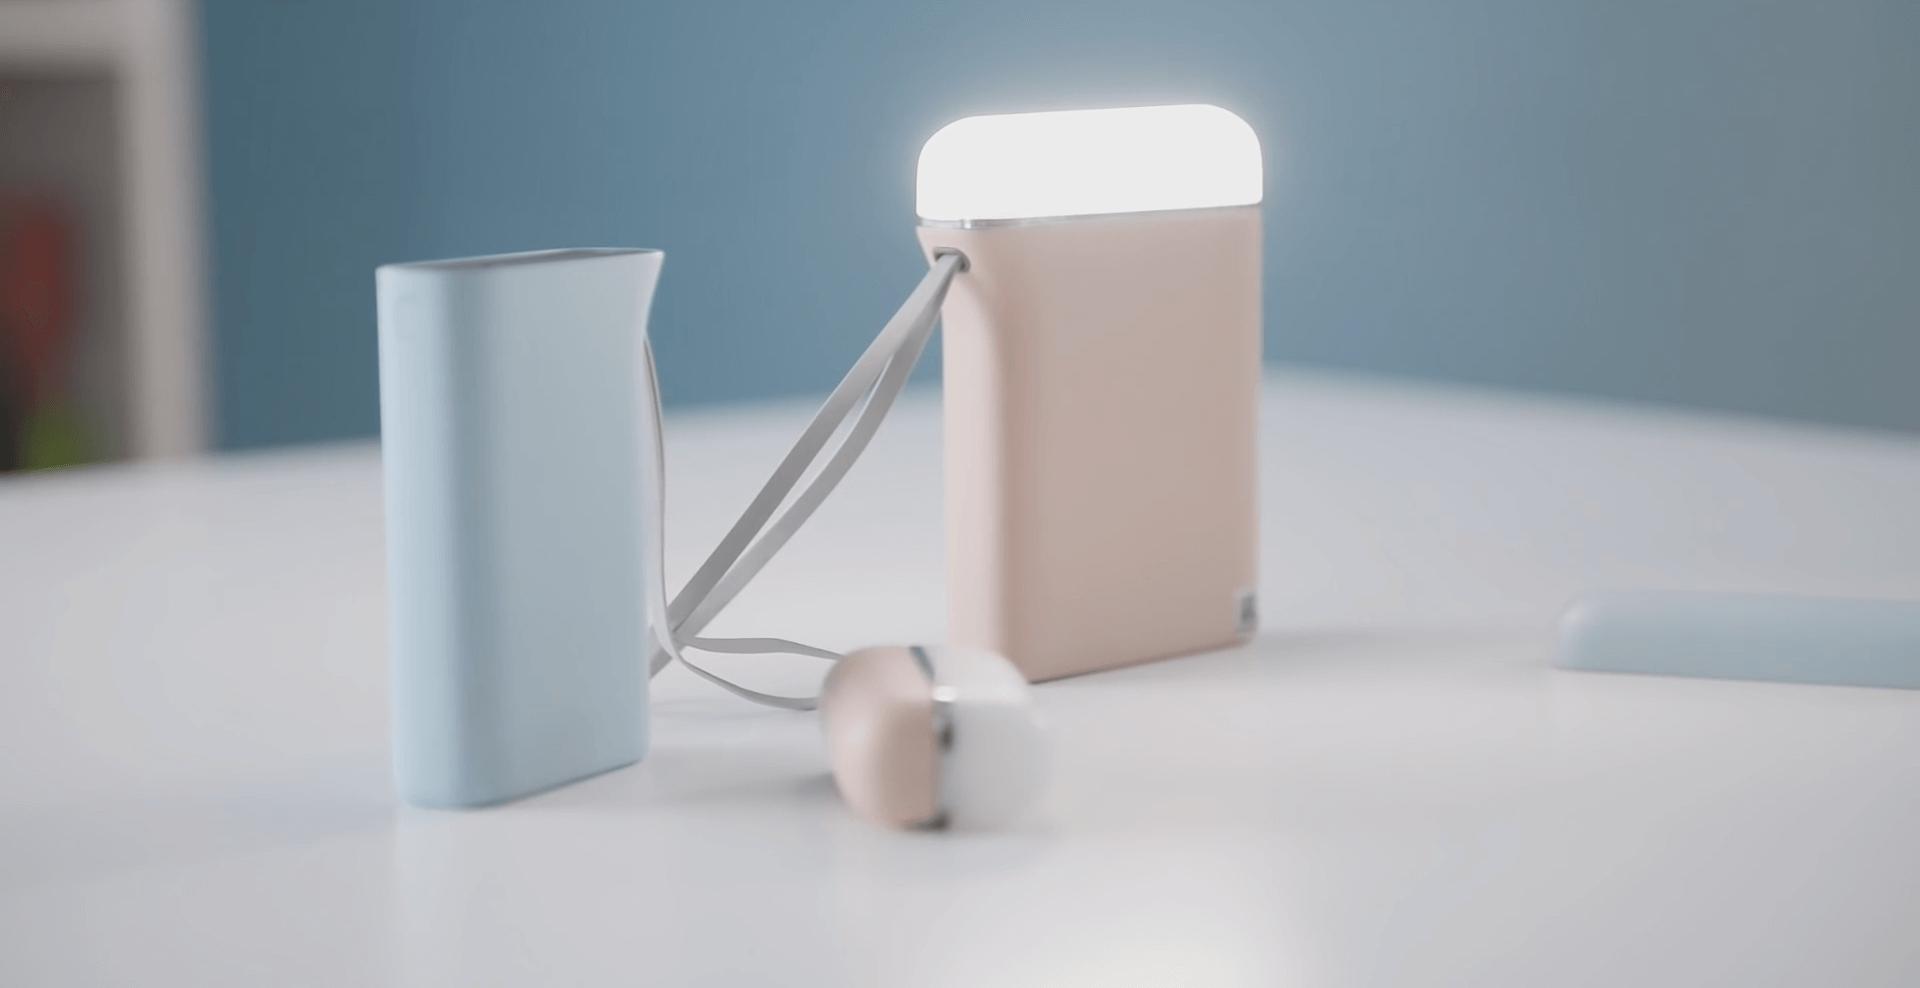 USB фонарик samsung kettle обзор